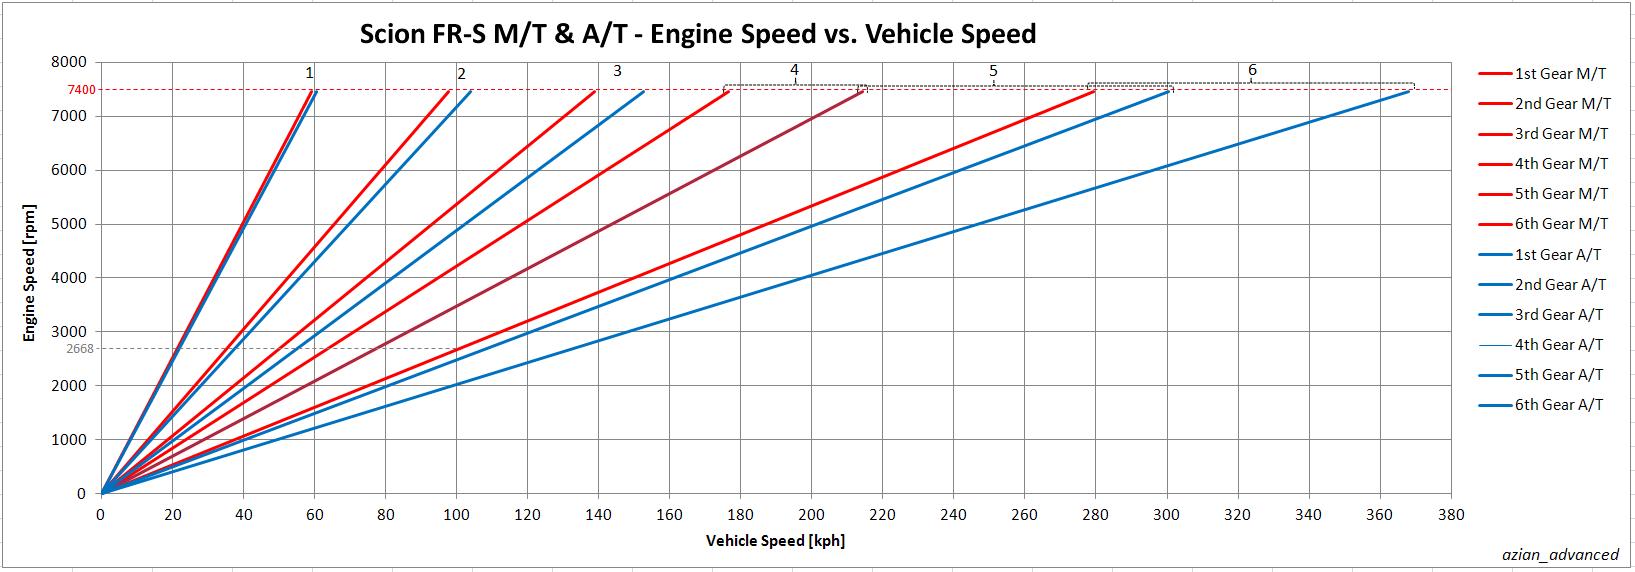 ScionFR-S-EngineSpeedvsVehicleSpeed-KPH